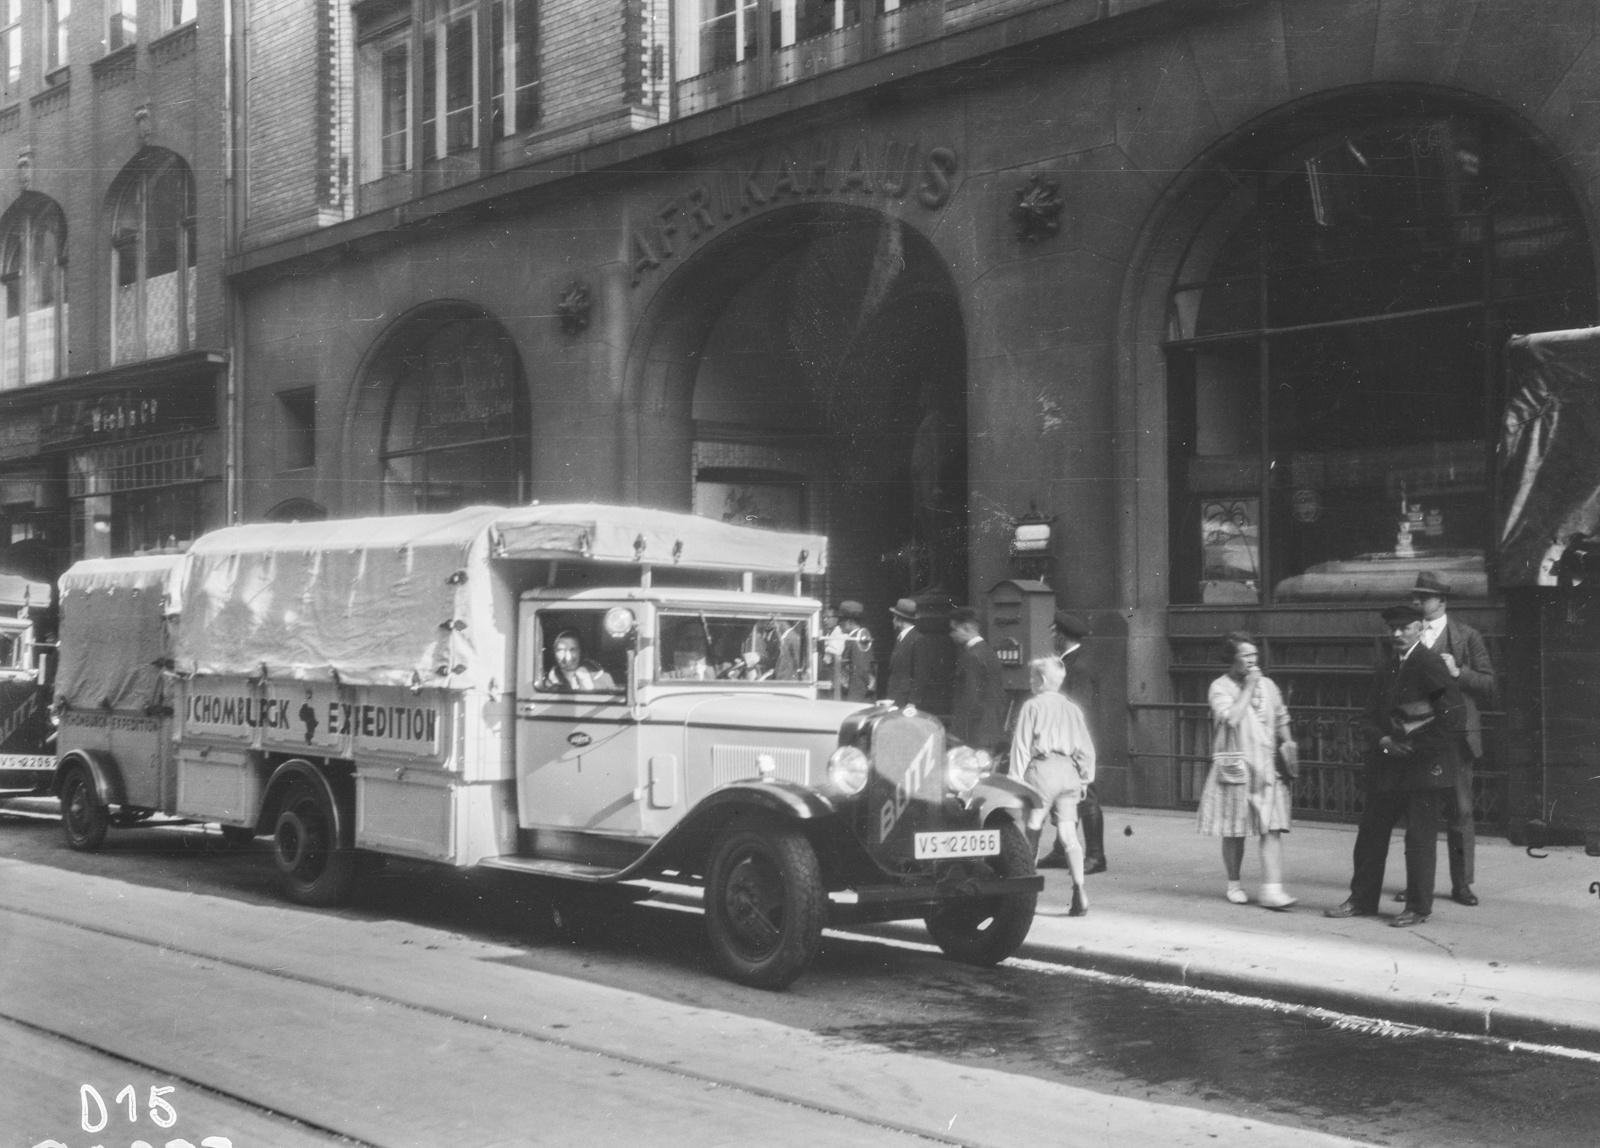 Гамбург. Выезд экспедиции (на фото грузовик марки Opel, серия Blitz)